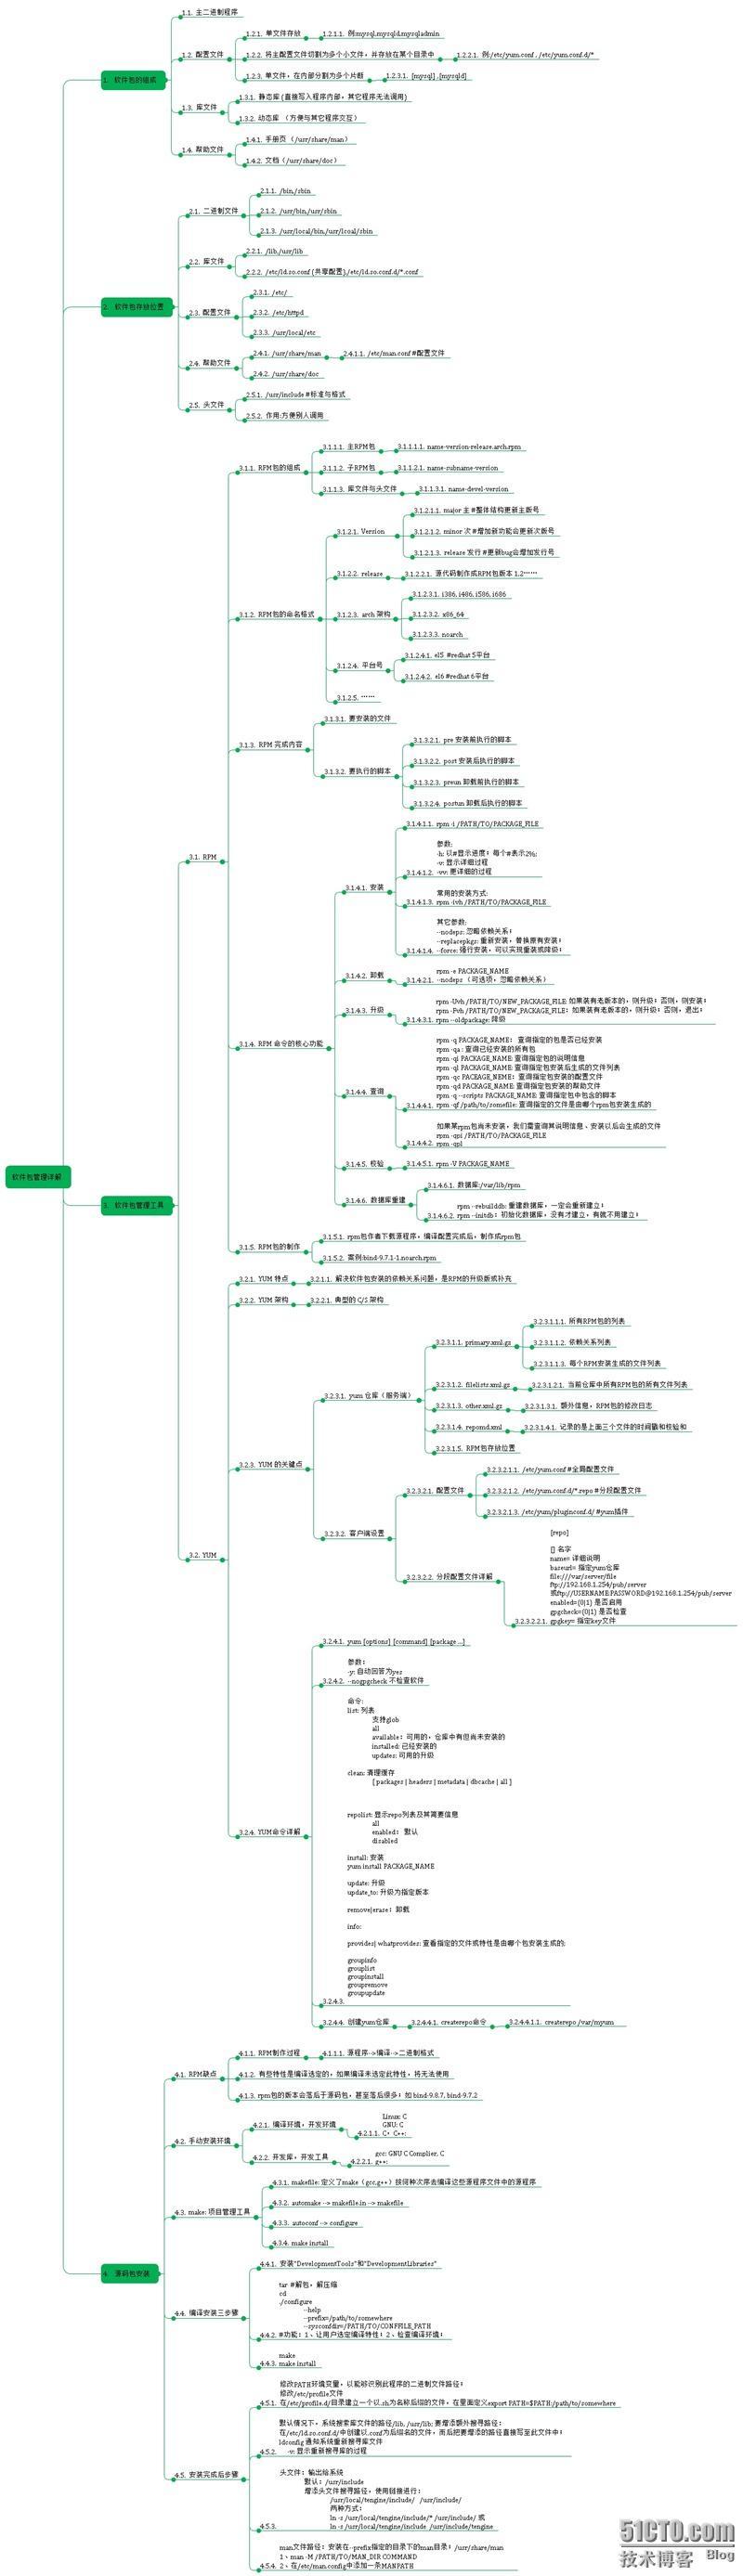 4. Linux 软件包管理详解